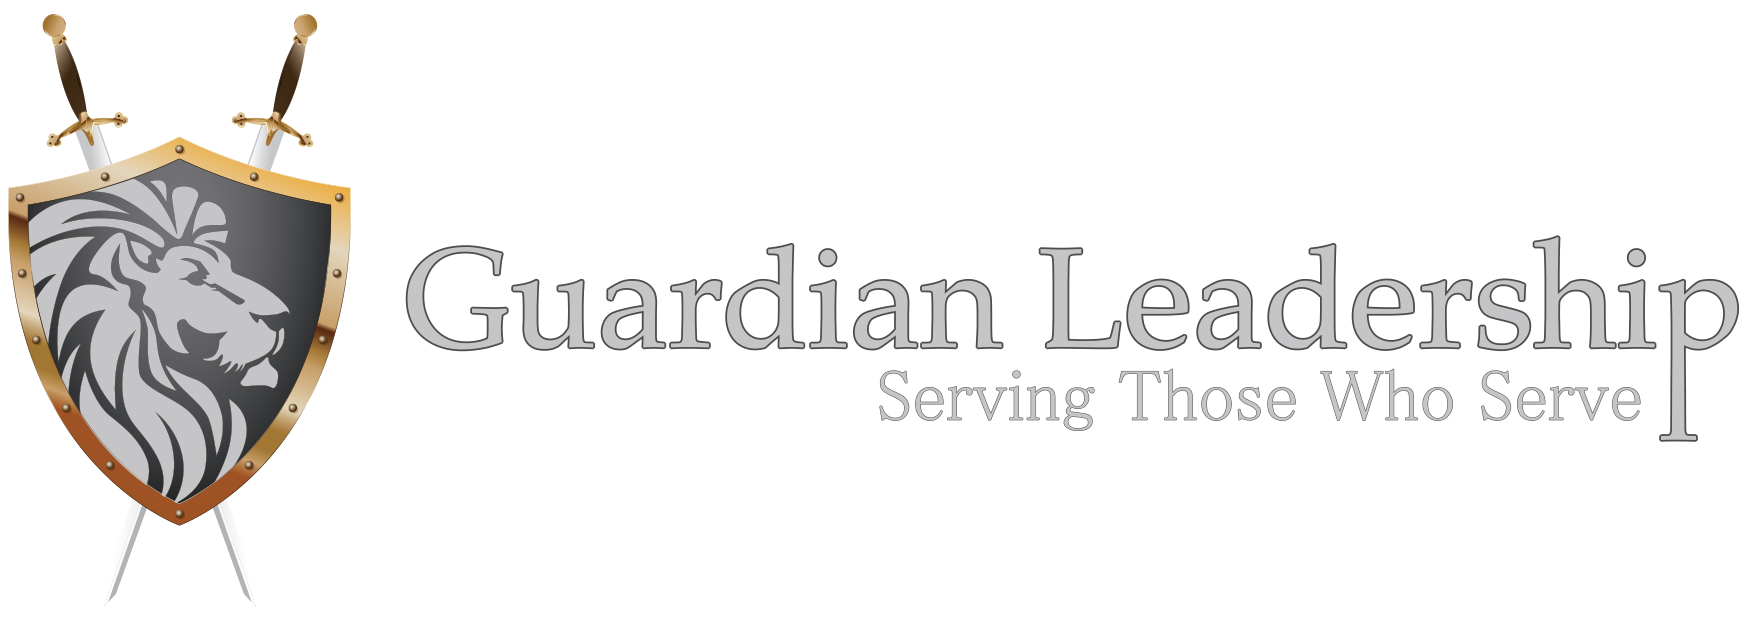 Guardian Leadership Serving Those Who Serve